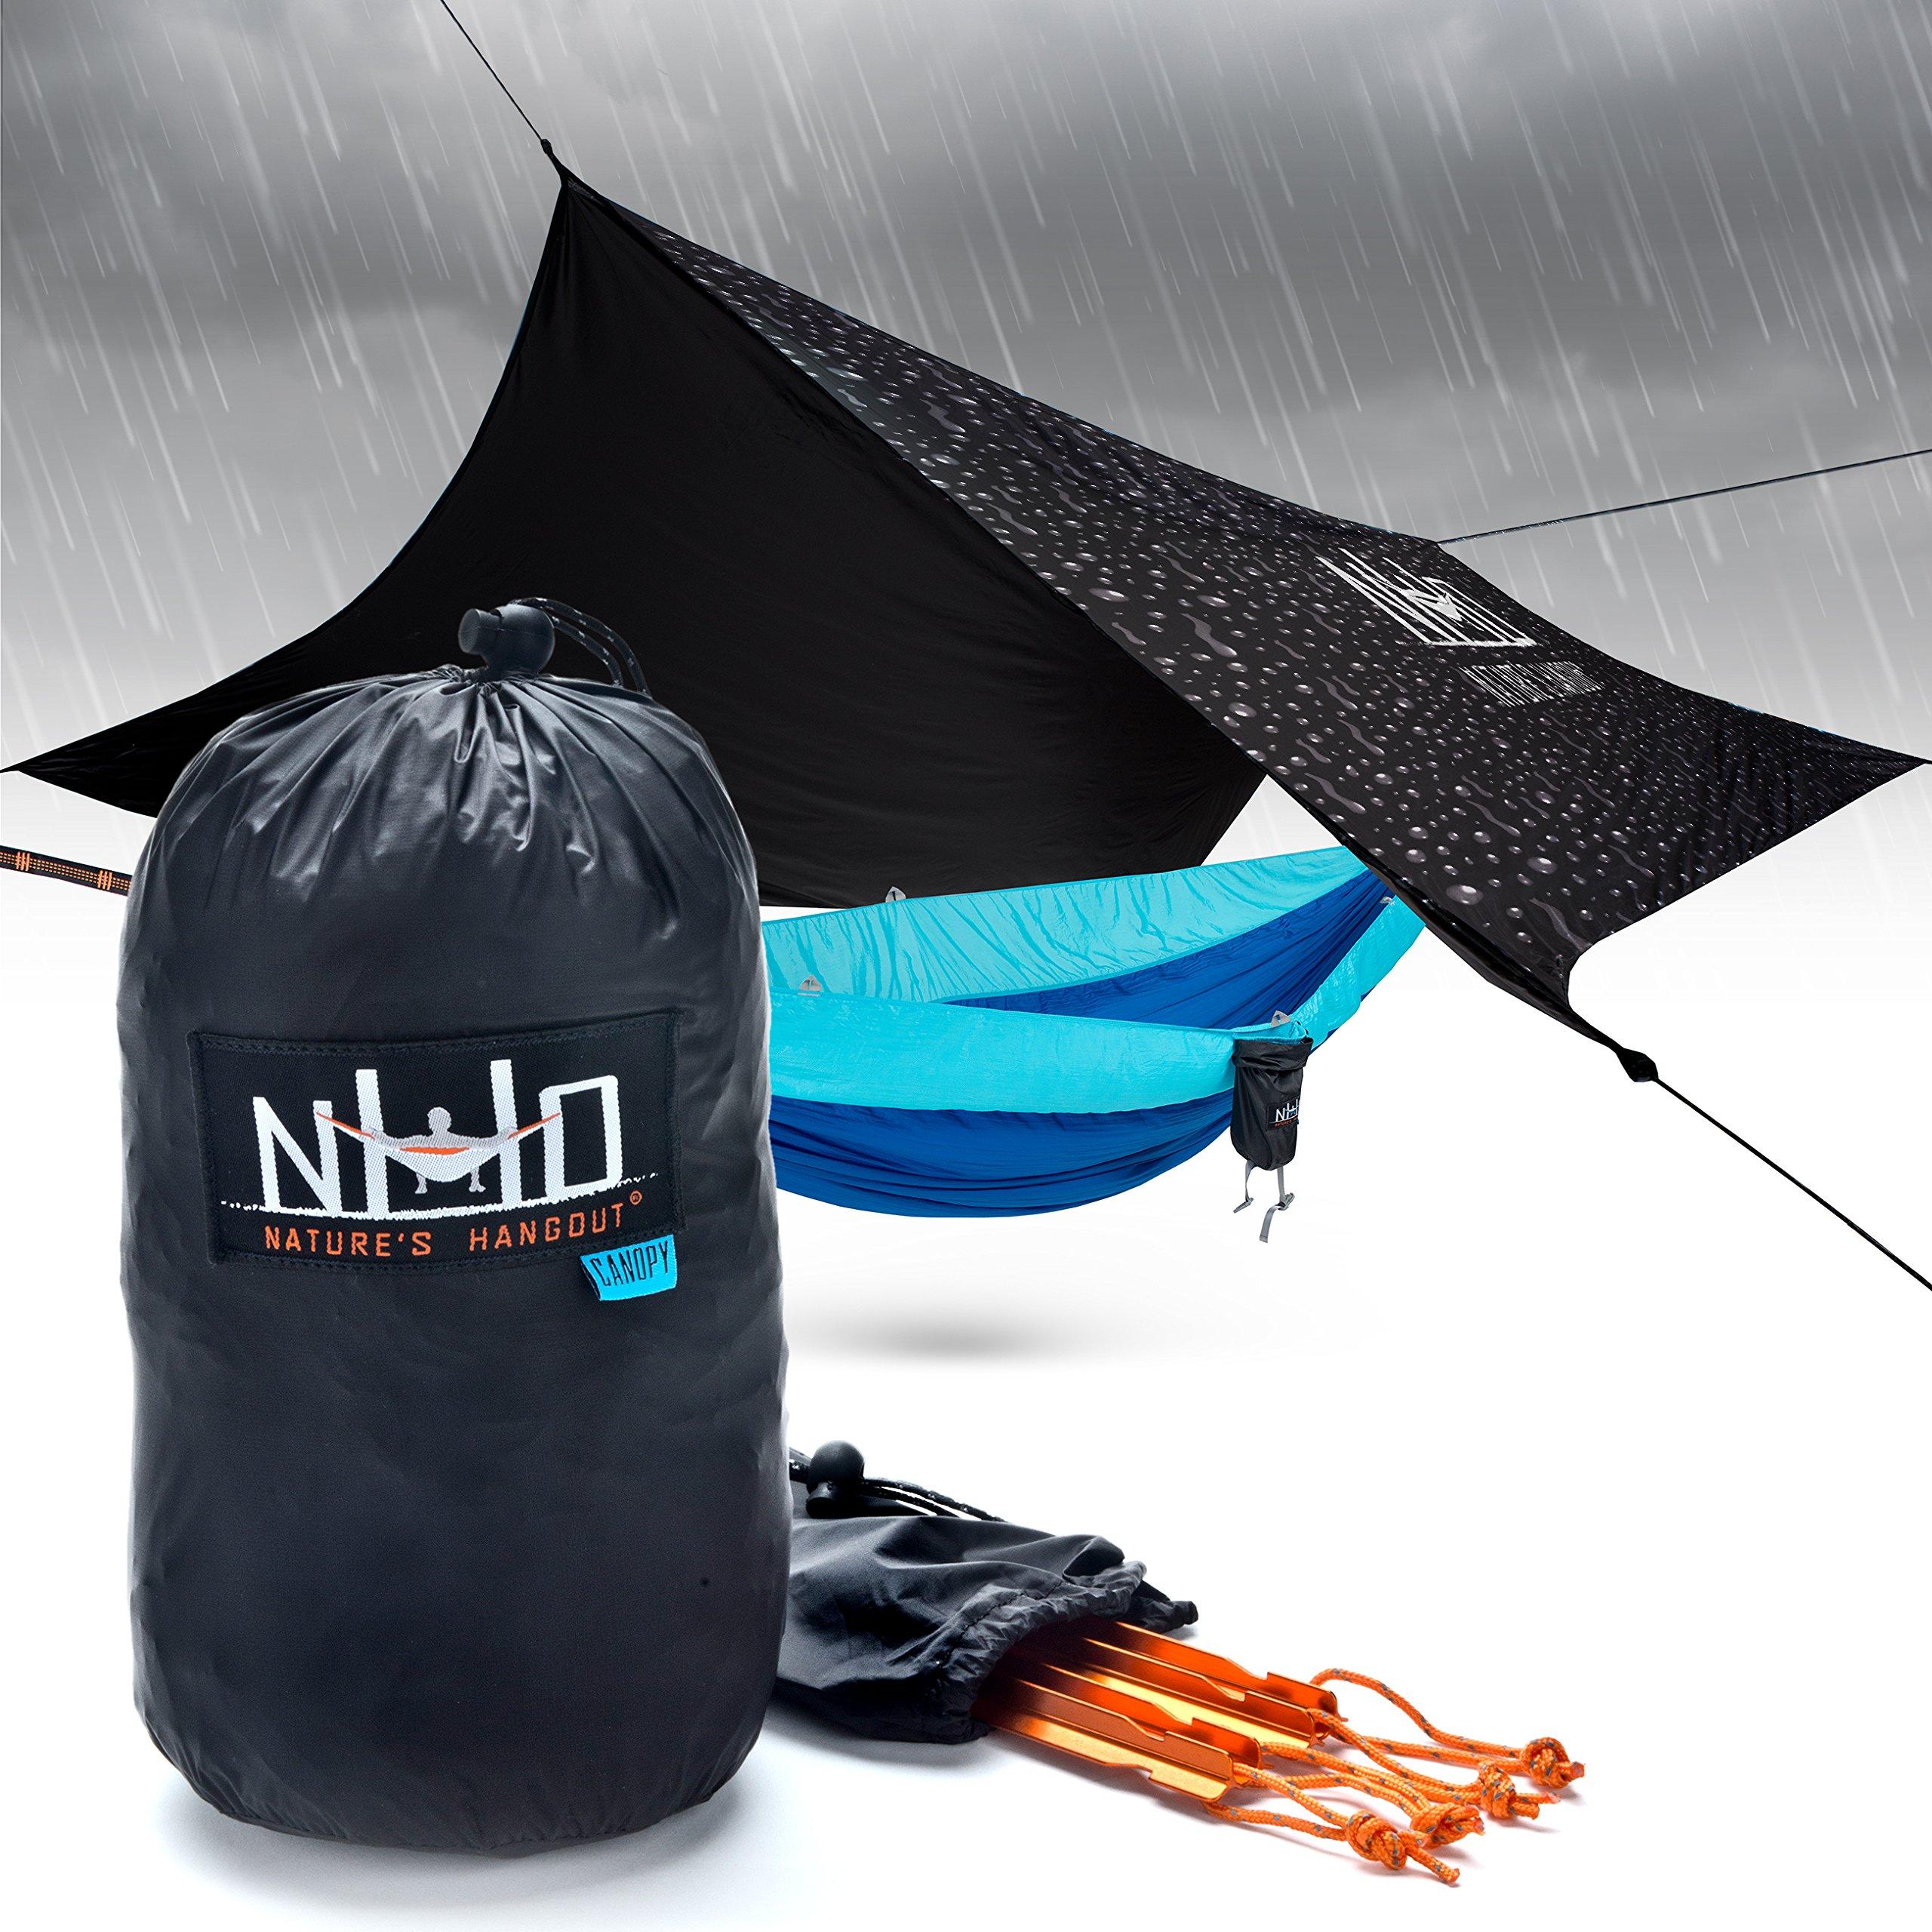 Hammock Rain Fly Tarp - 100% Waterproof SilNylon Hammock Tent, Oversized Double Parachute Style Hammocking, Lightweight Tarp Tent Ideal for Camping & Backpacking, Essential Hammock Cover Accessory